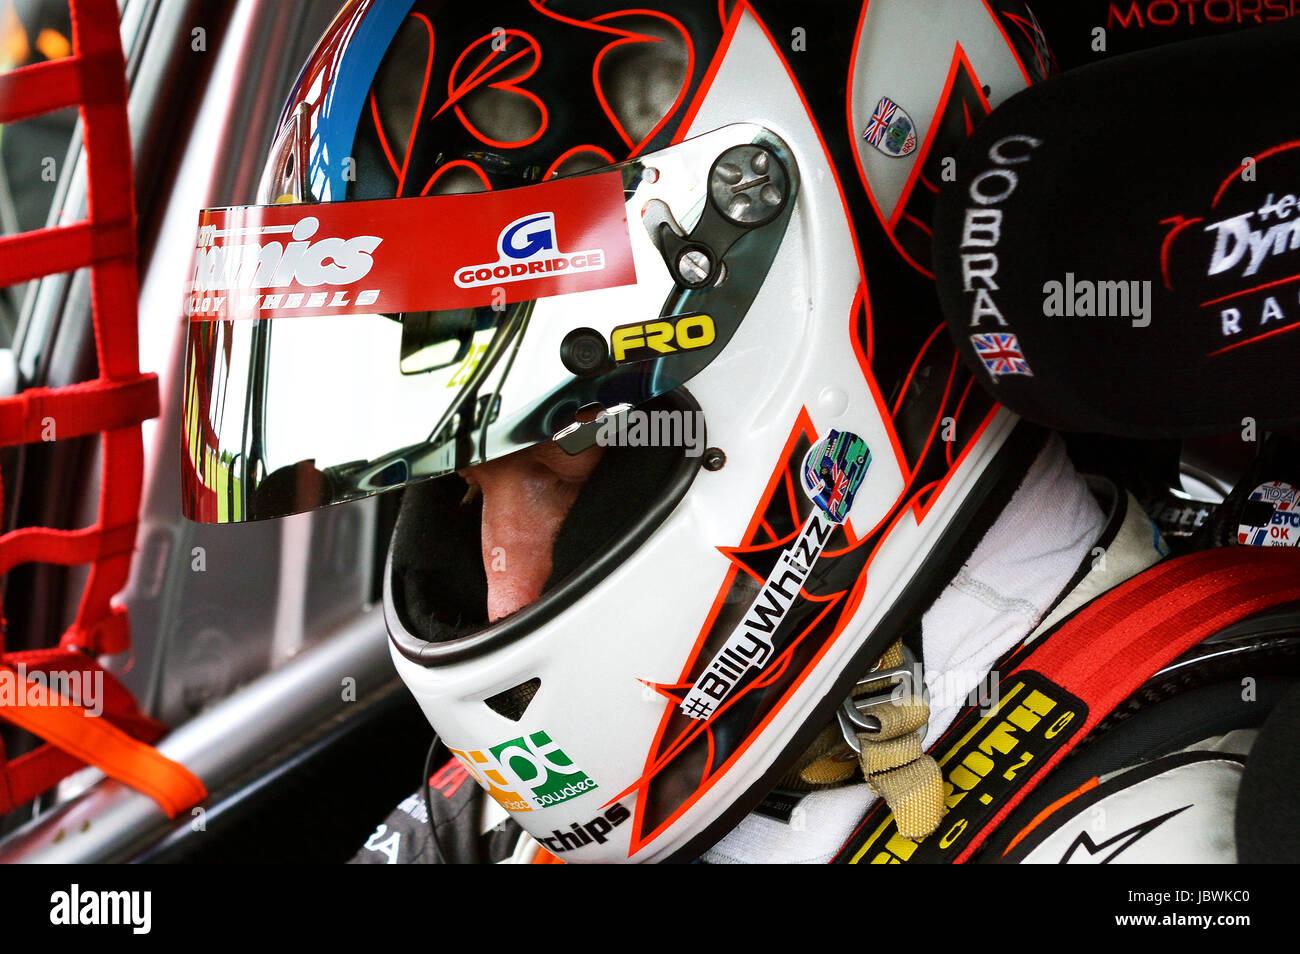 Dunlop MSA British Touring Car Championship, Matt Hear driving his Honda, - Stock Image